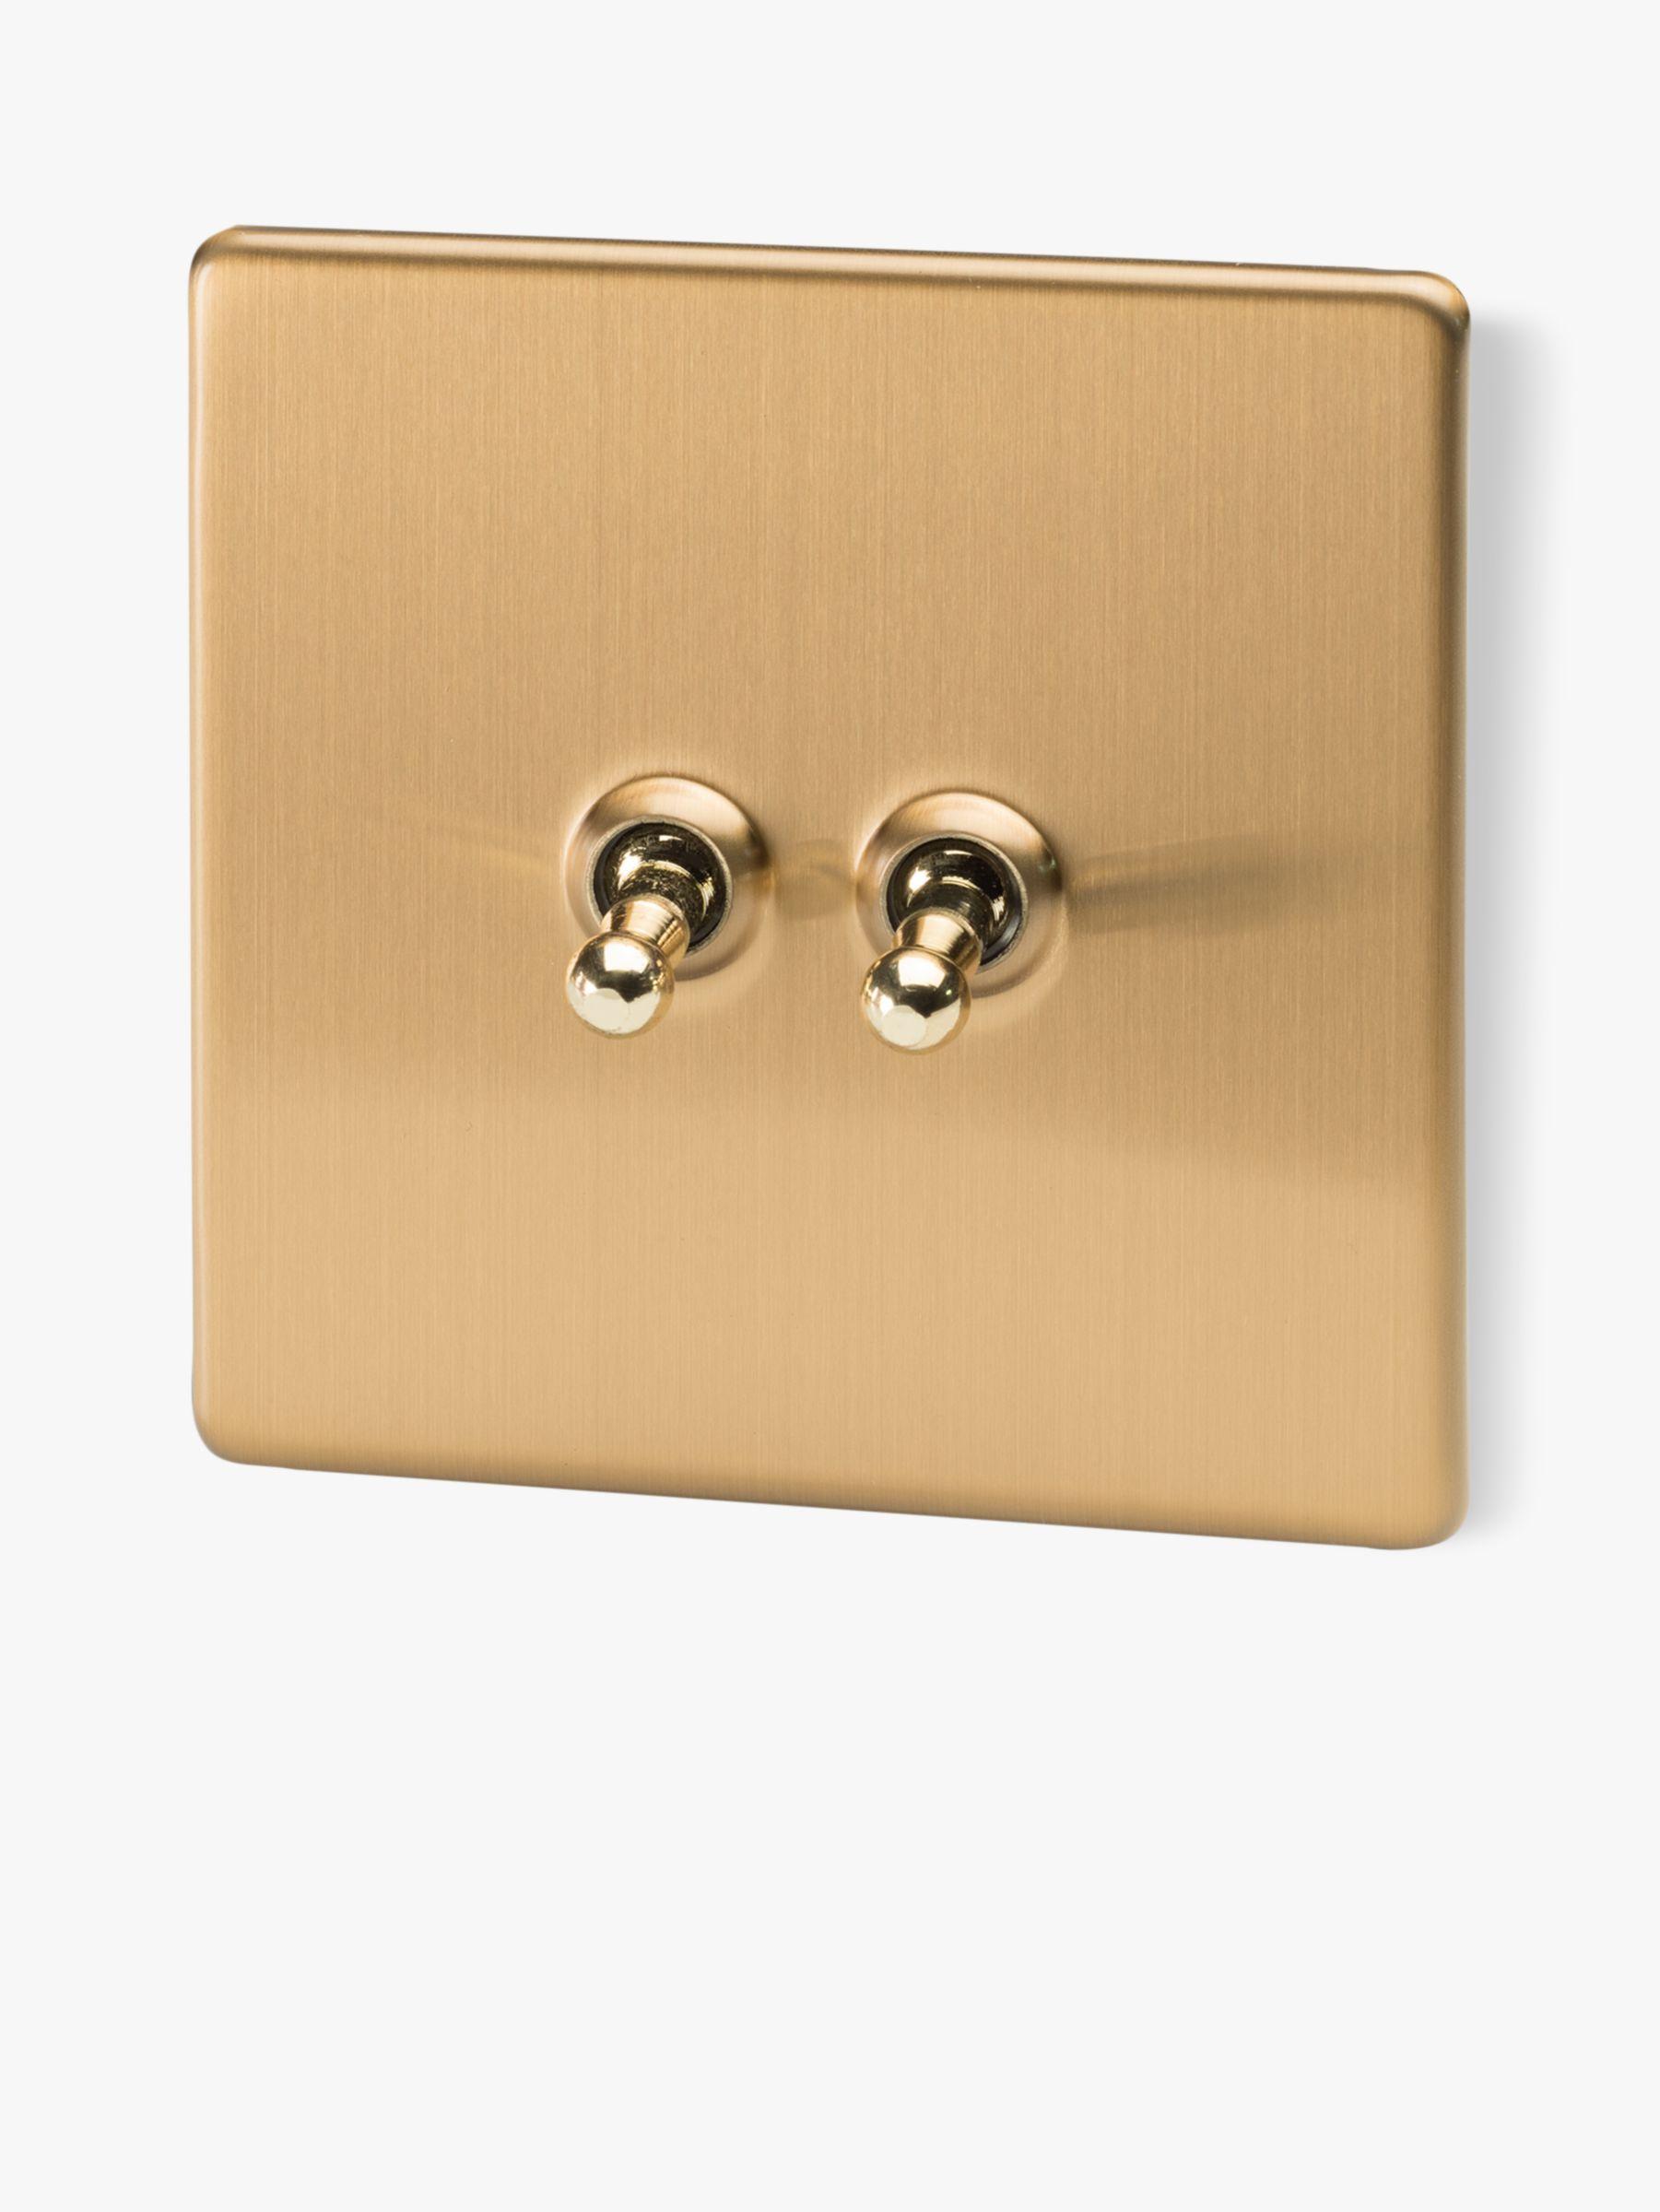 Varilight 2 Gang 2 Way Toggle Switch Brushed Brass At John Lewis Partners